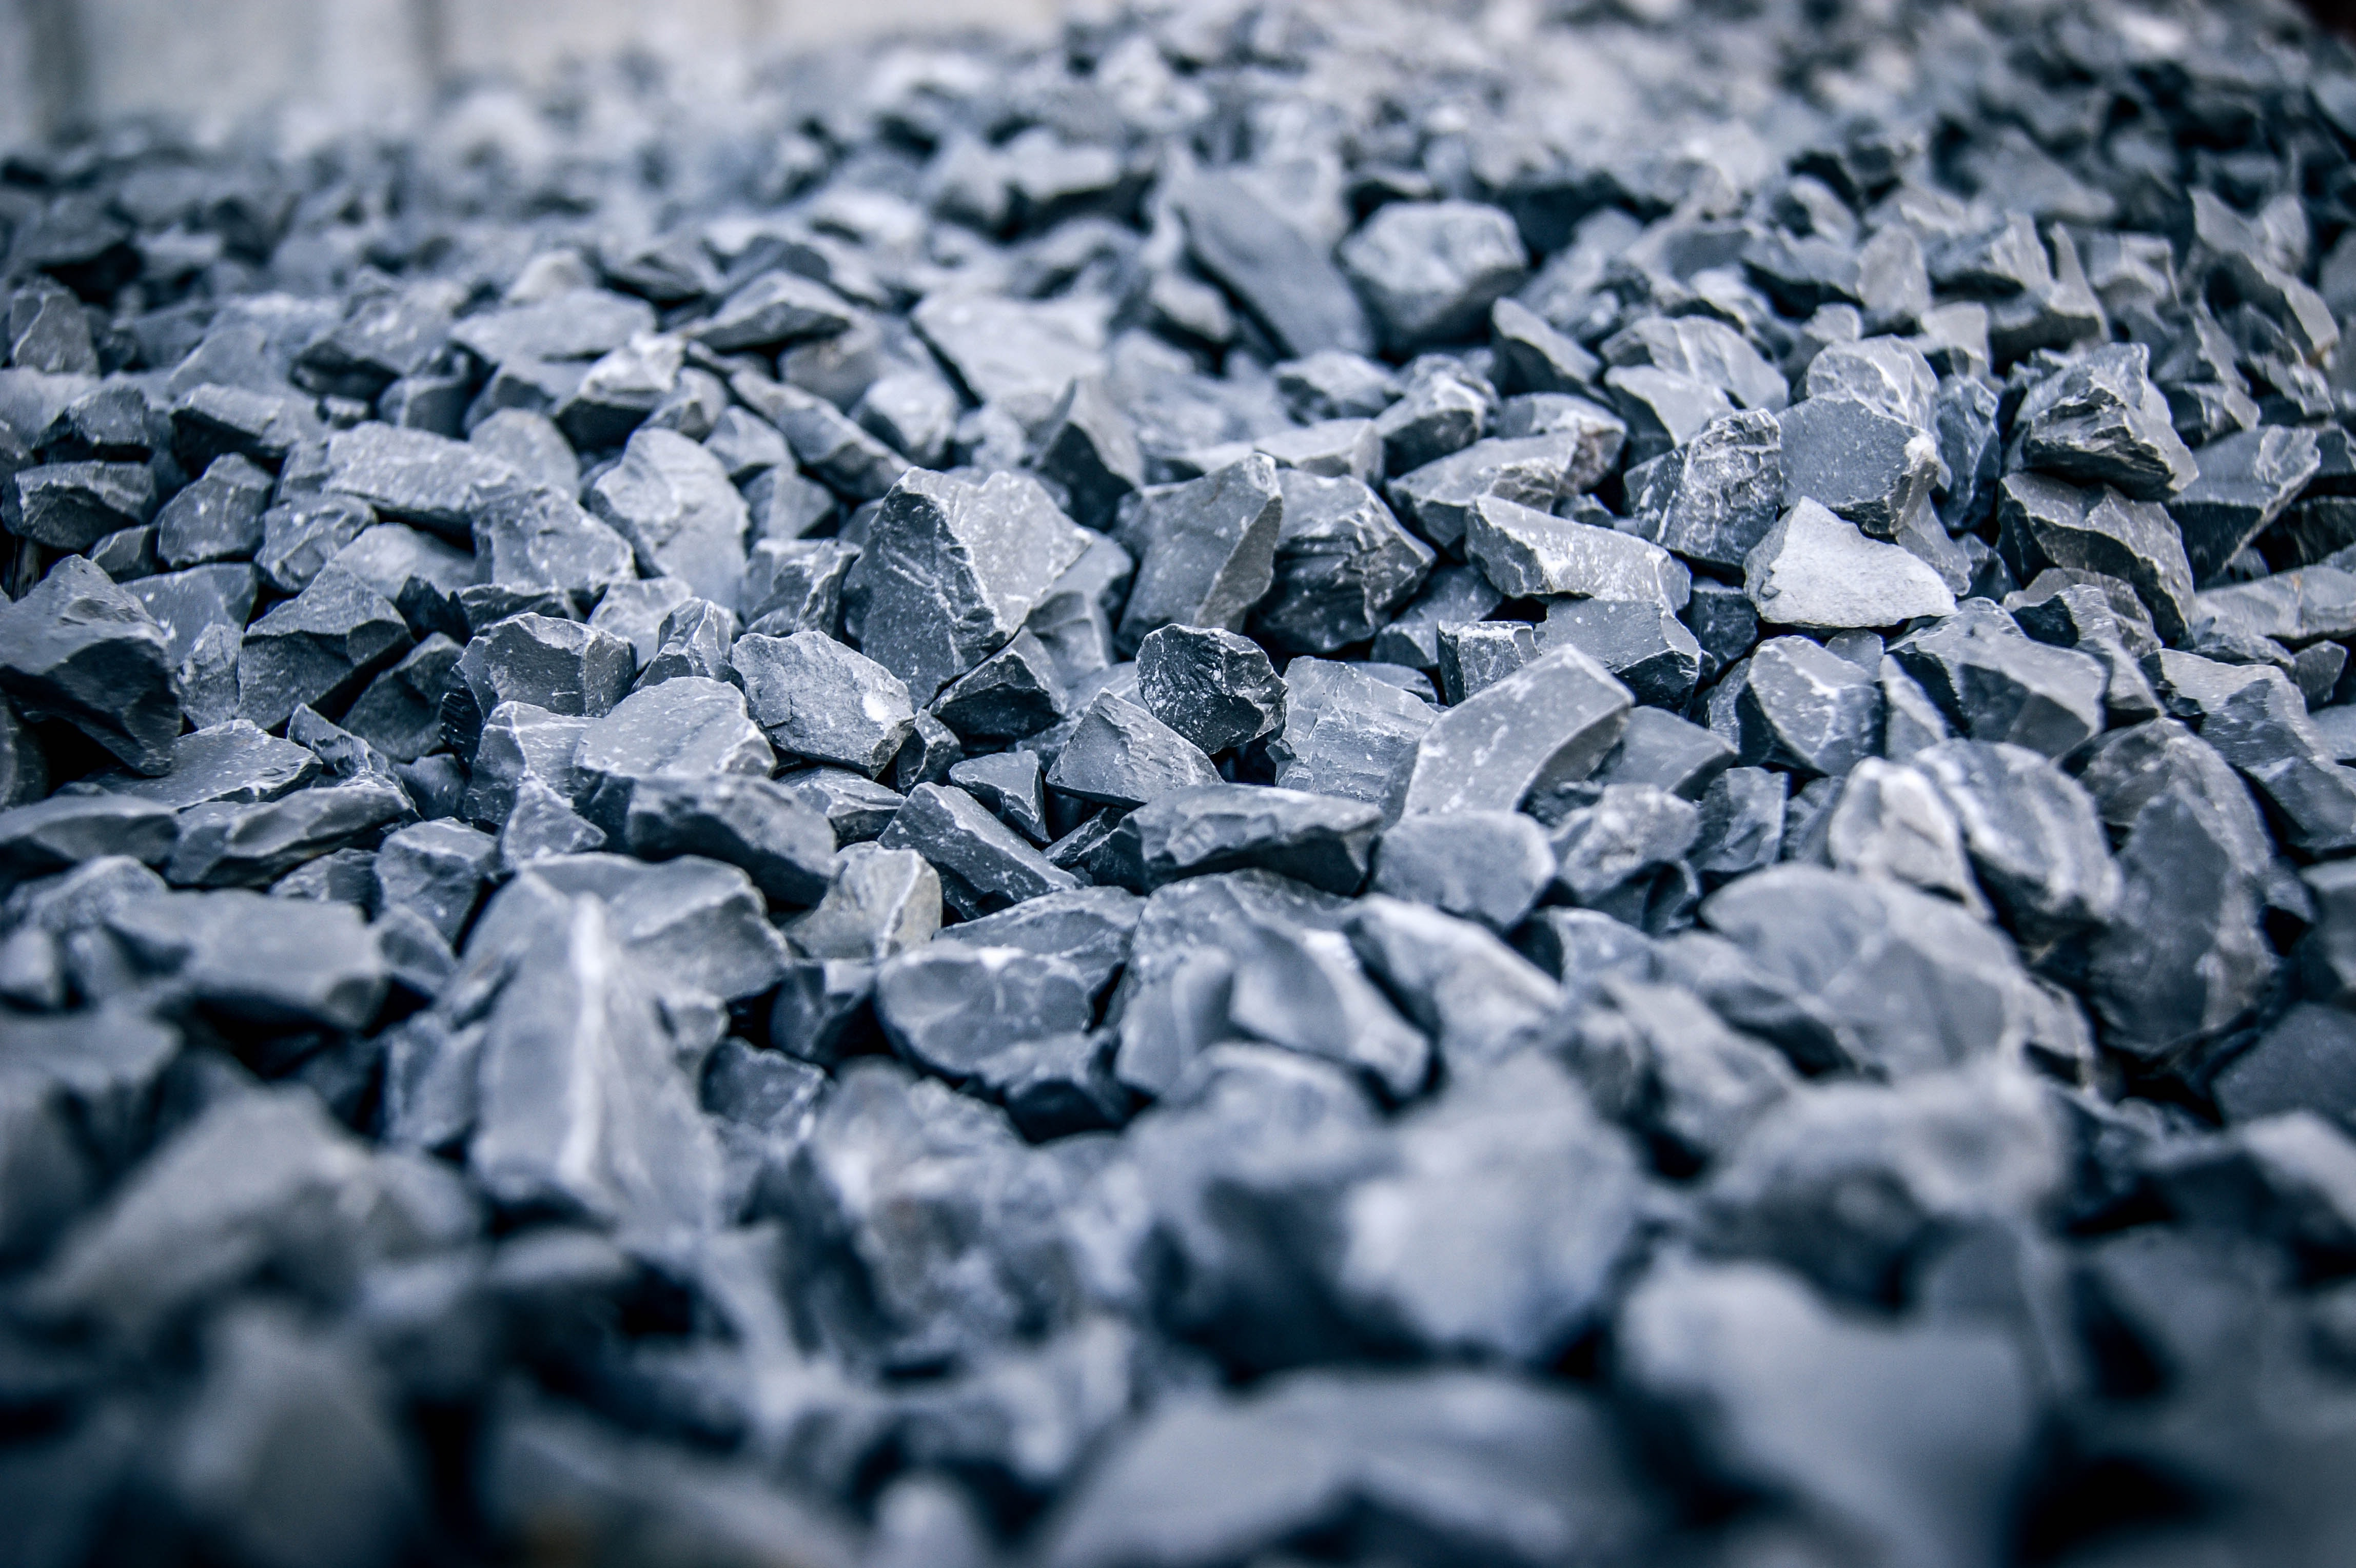 Batu biasa digunakan untuk campuran semen. (Foto: Pexels – Johnny)